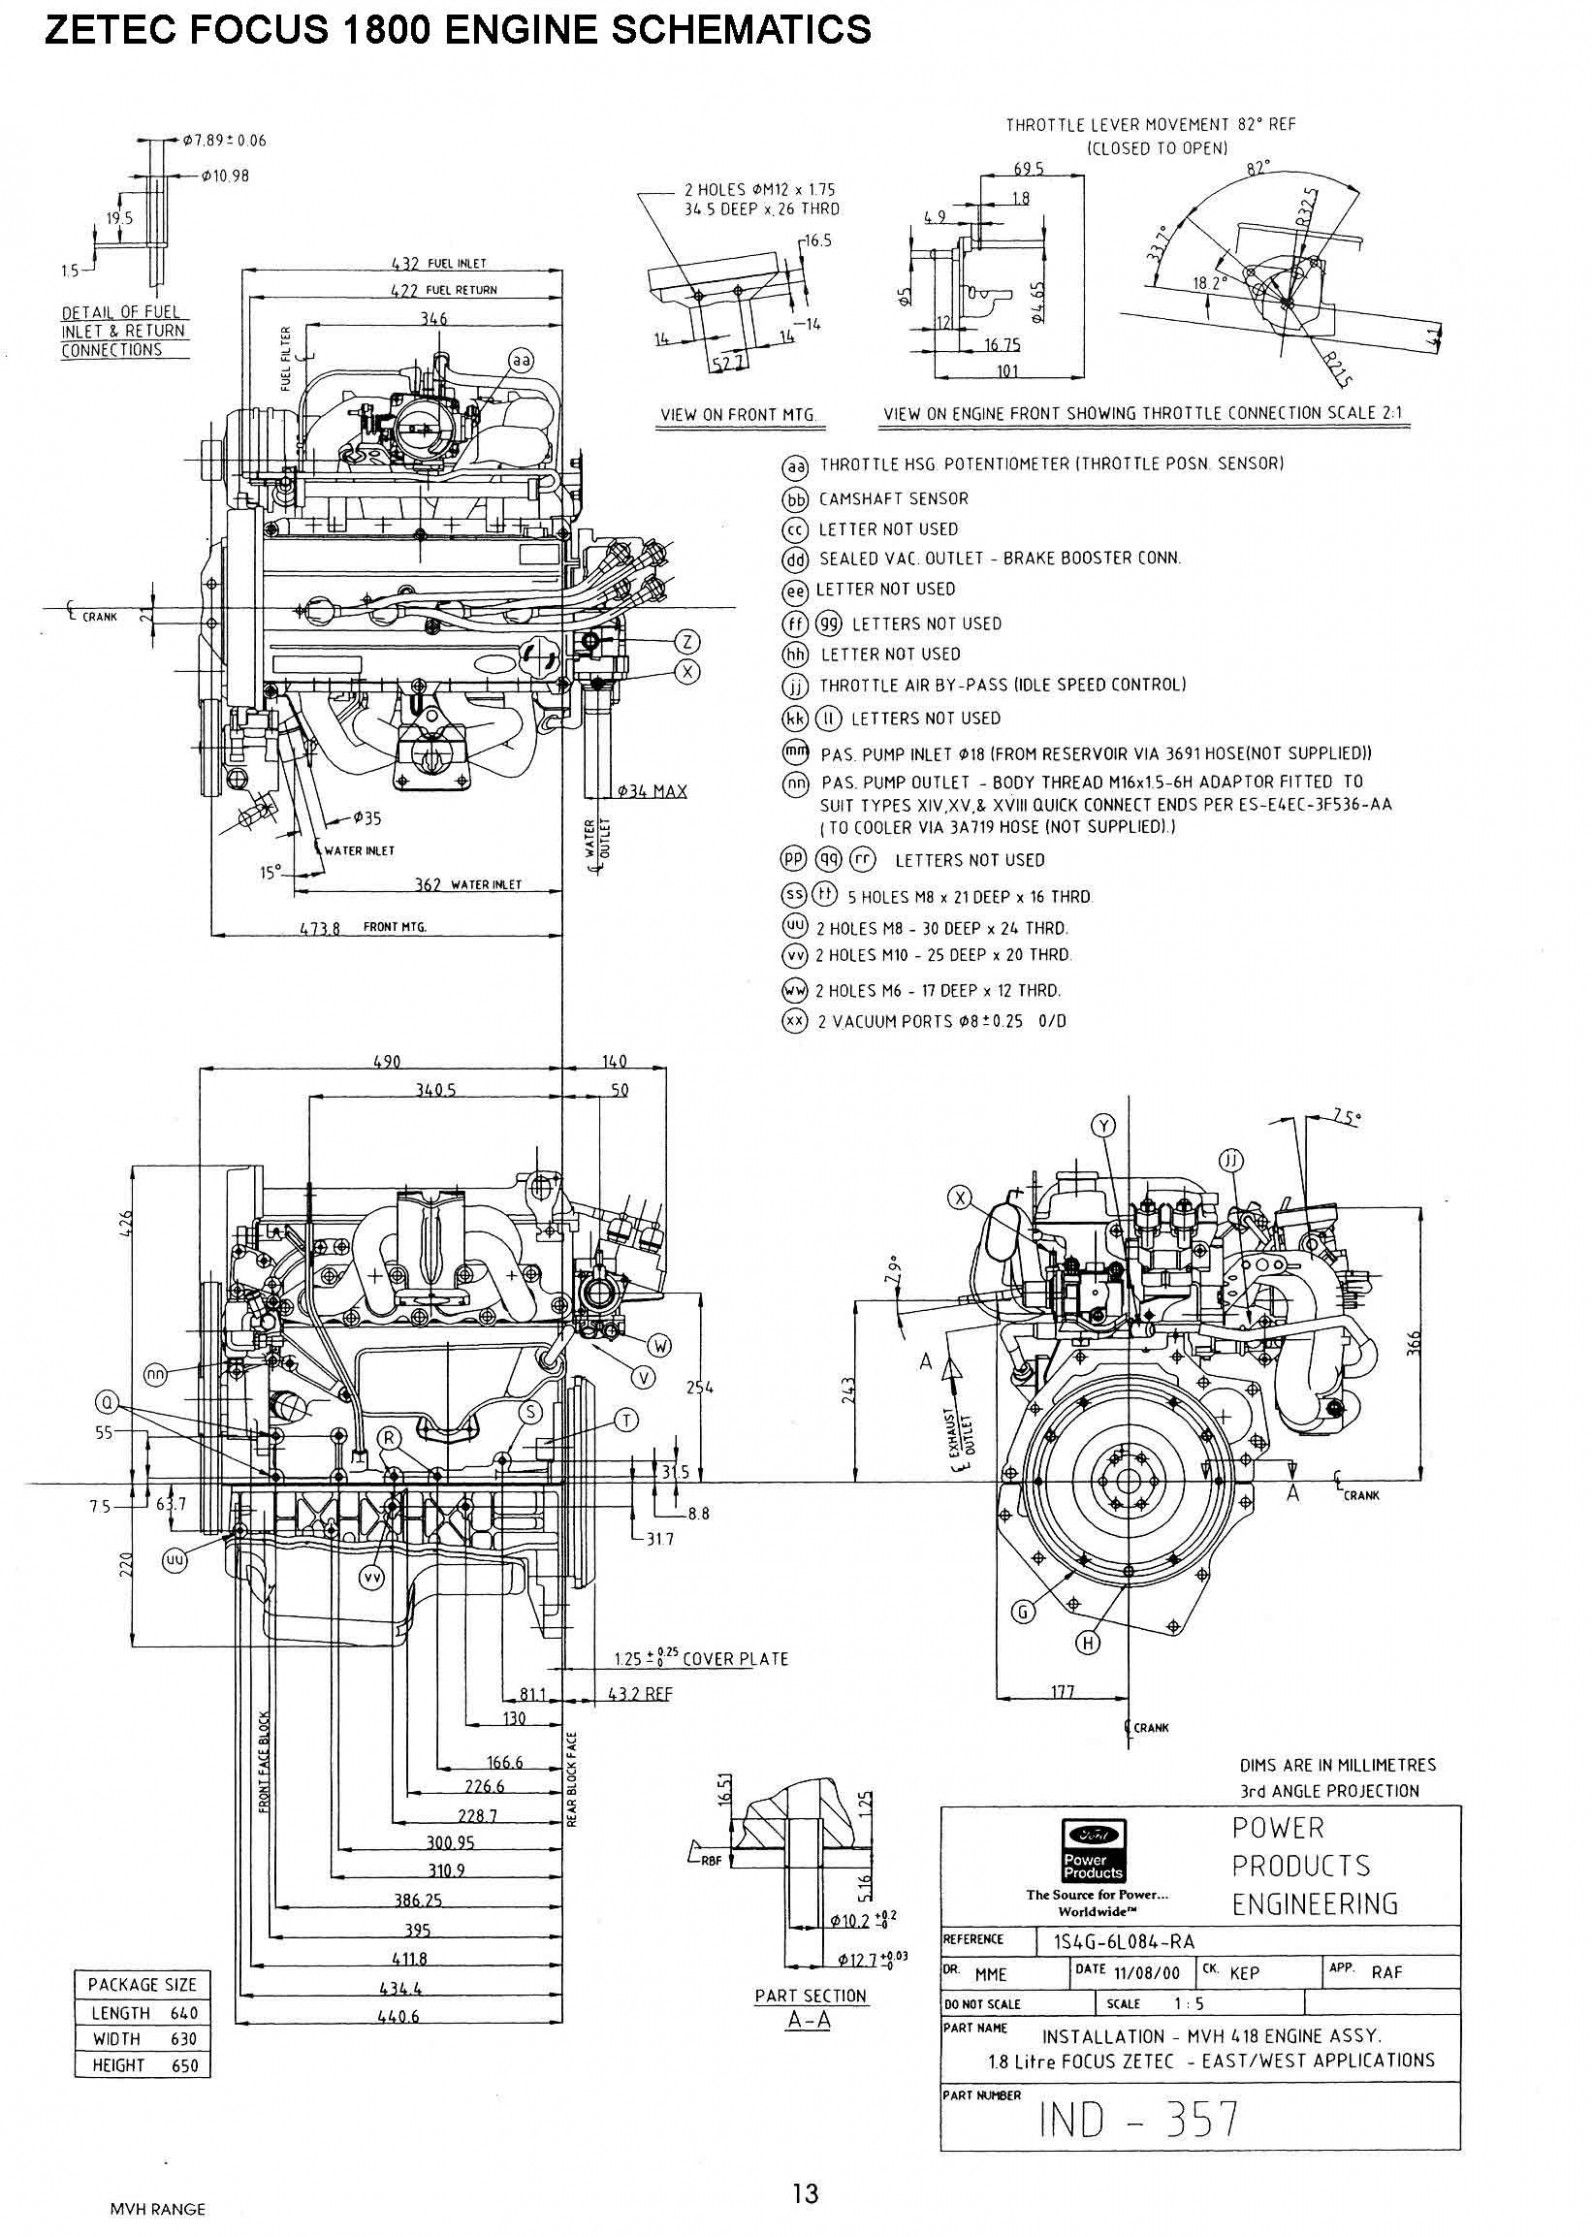 Ford Focus Mk8 Engine Diagram Di